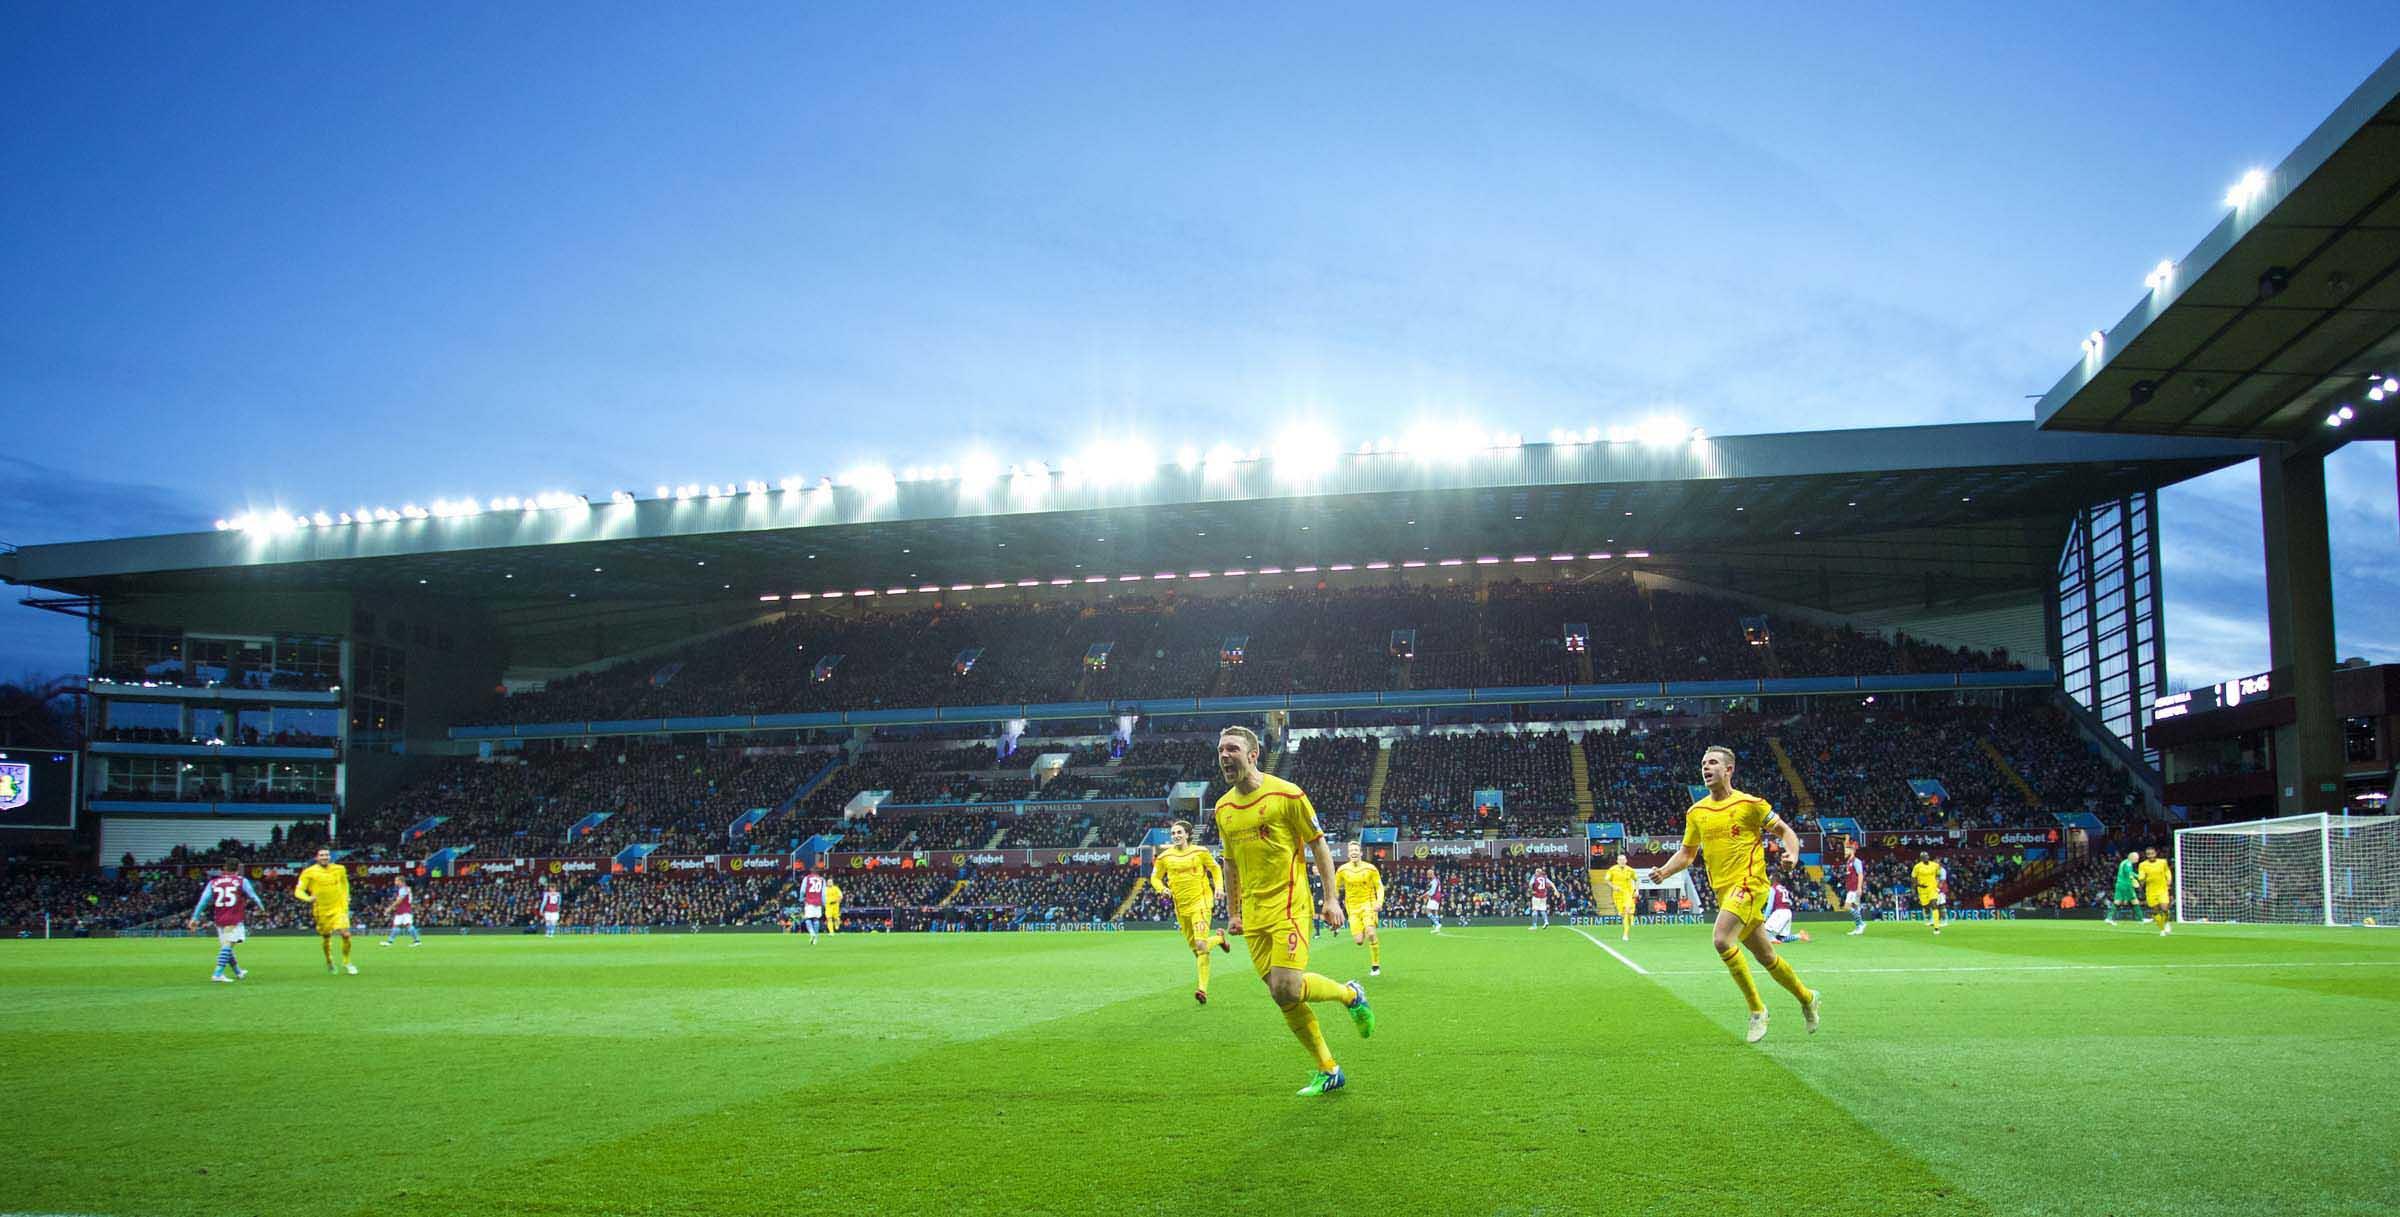 Football - FA Premier League - Aston Villa FC v Liverpool FC